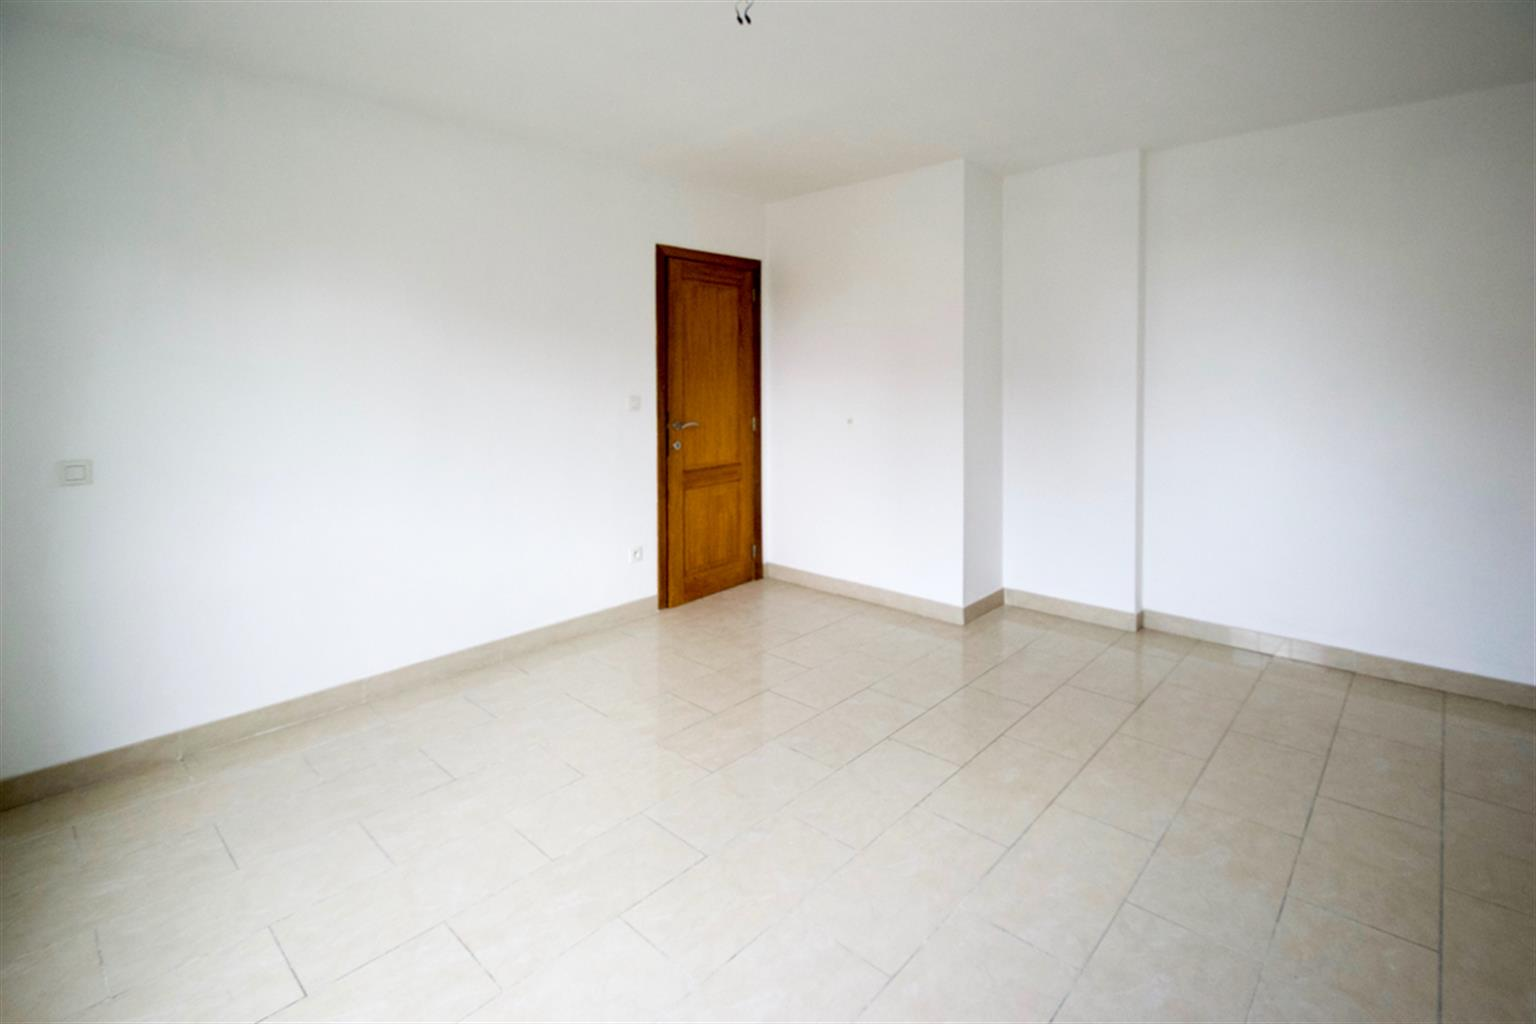 Appartement - Binche Leval-Trahegnies - #4277280-2